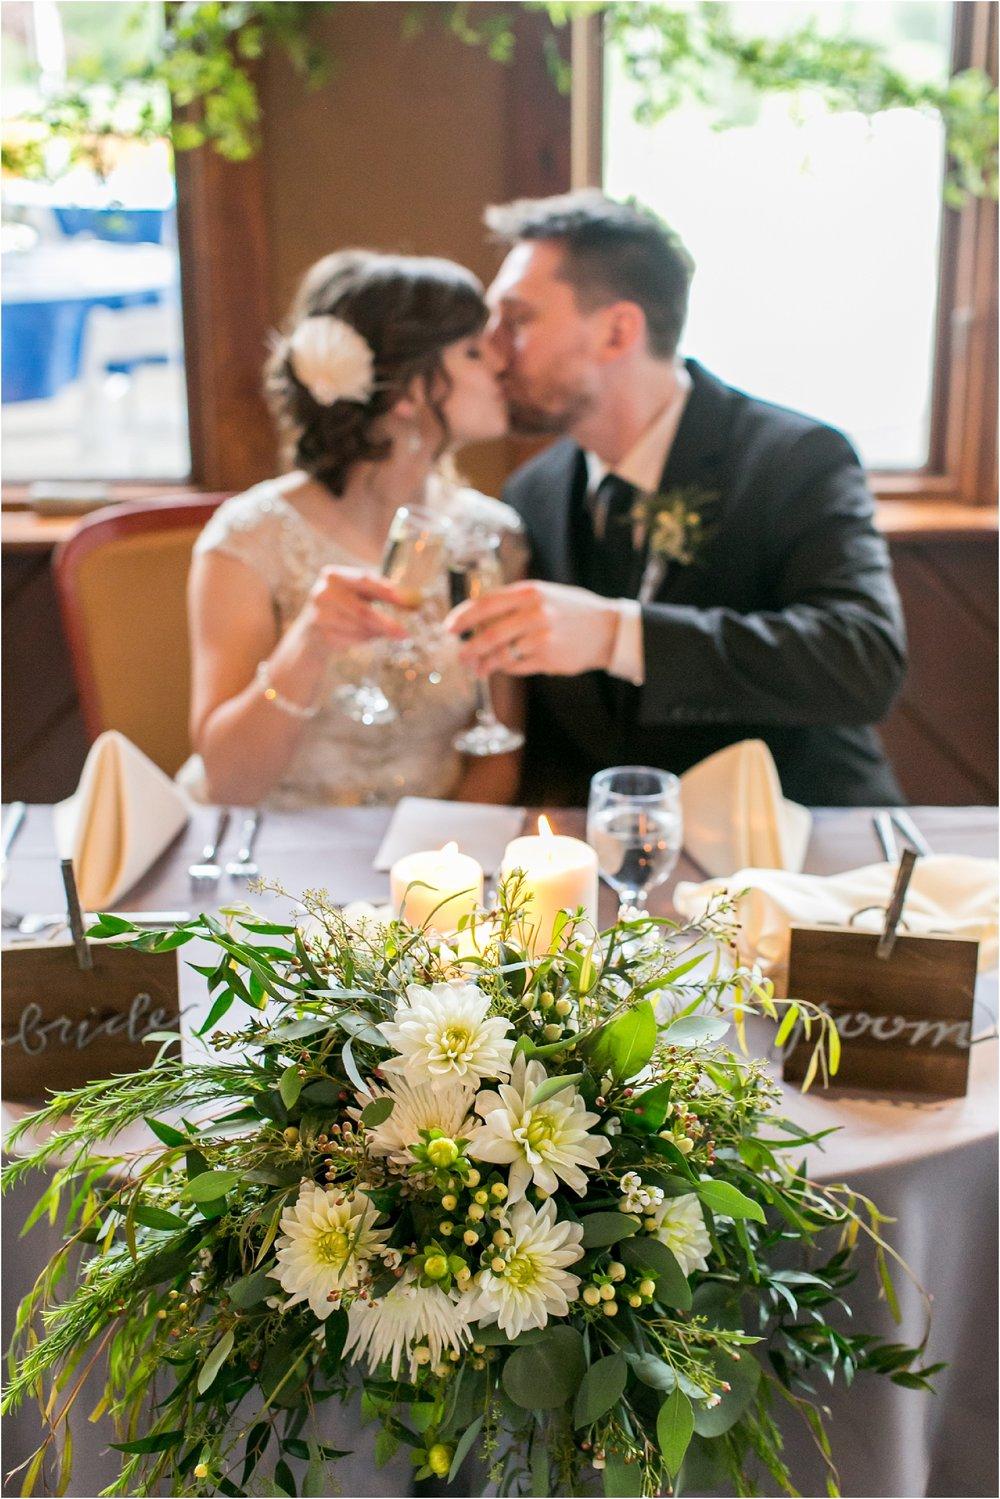 Smith Wedding Liberty Forge Golf Course Wedding Living Radiant Photography Photos_0161.jpg